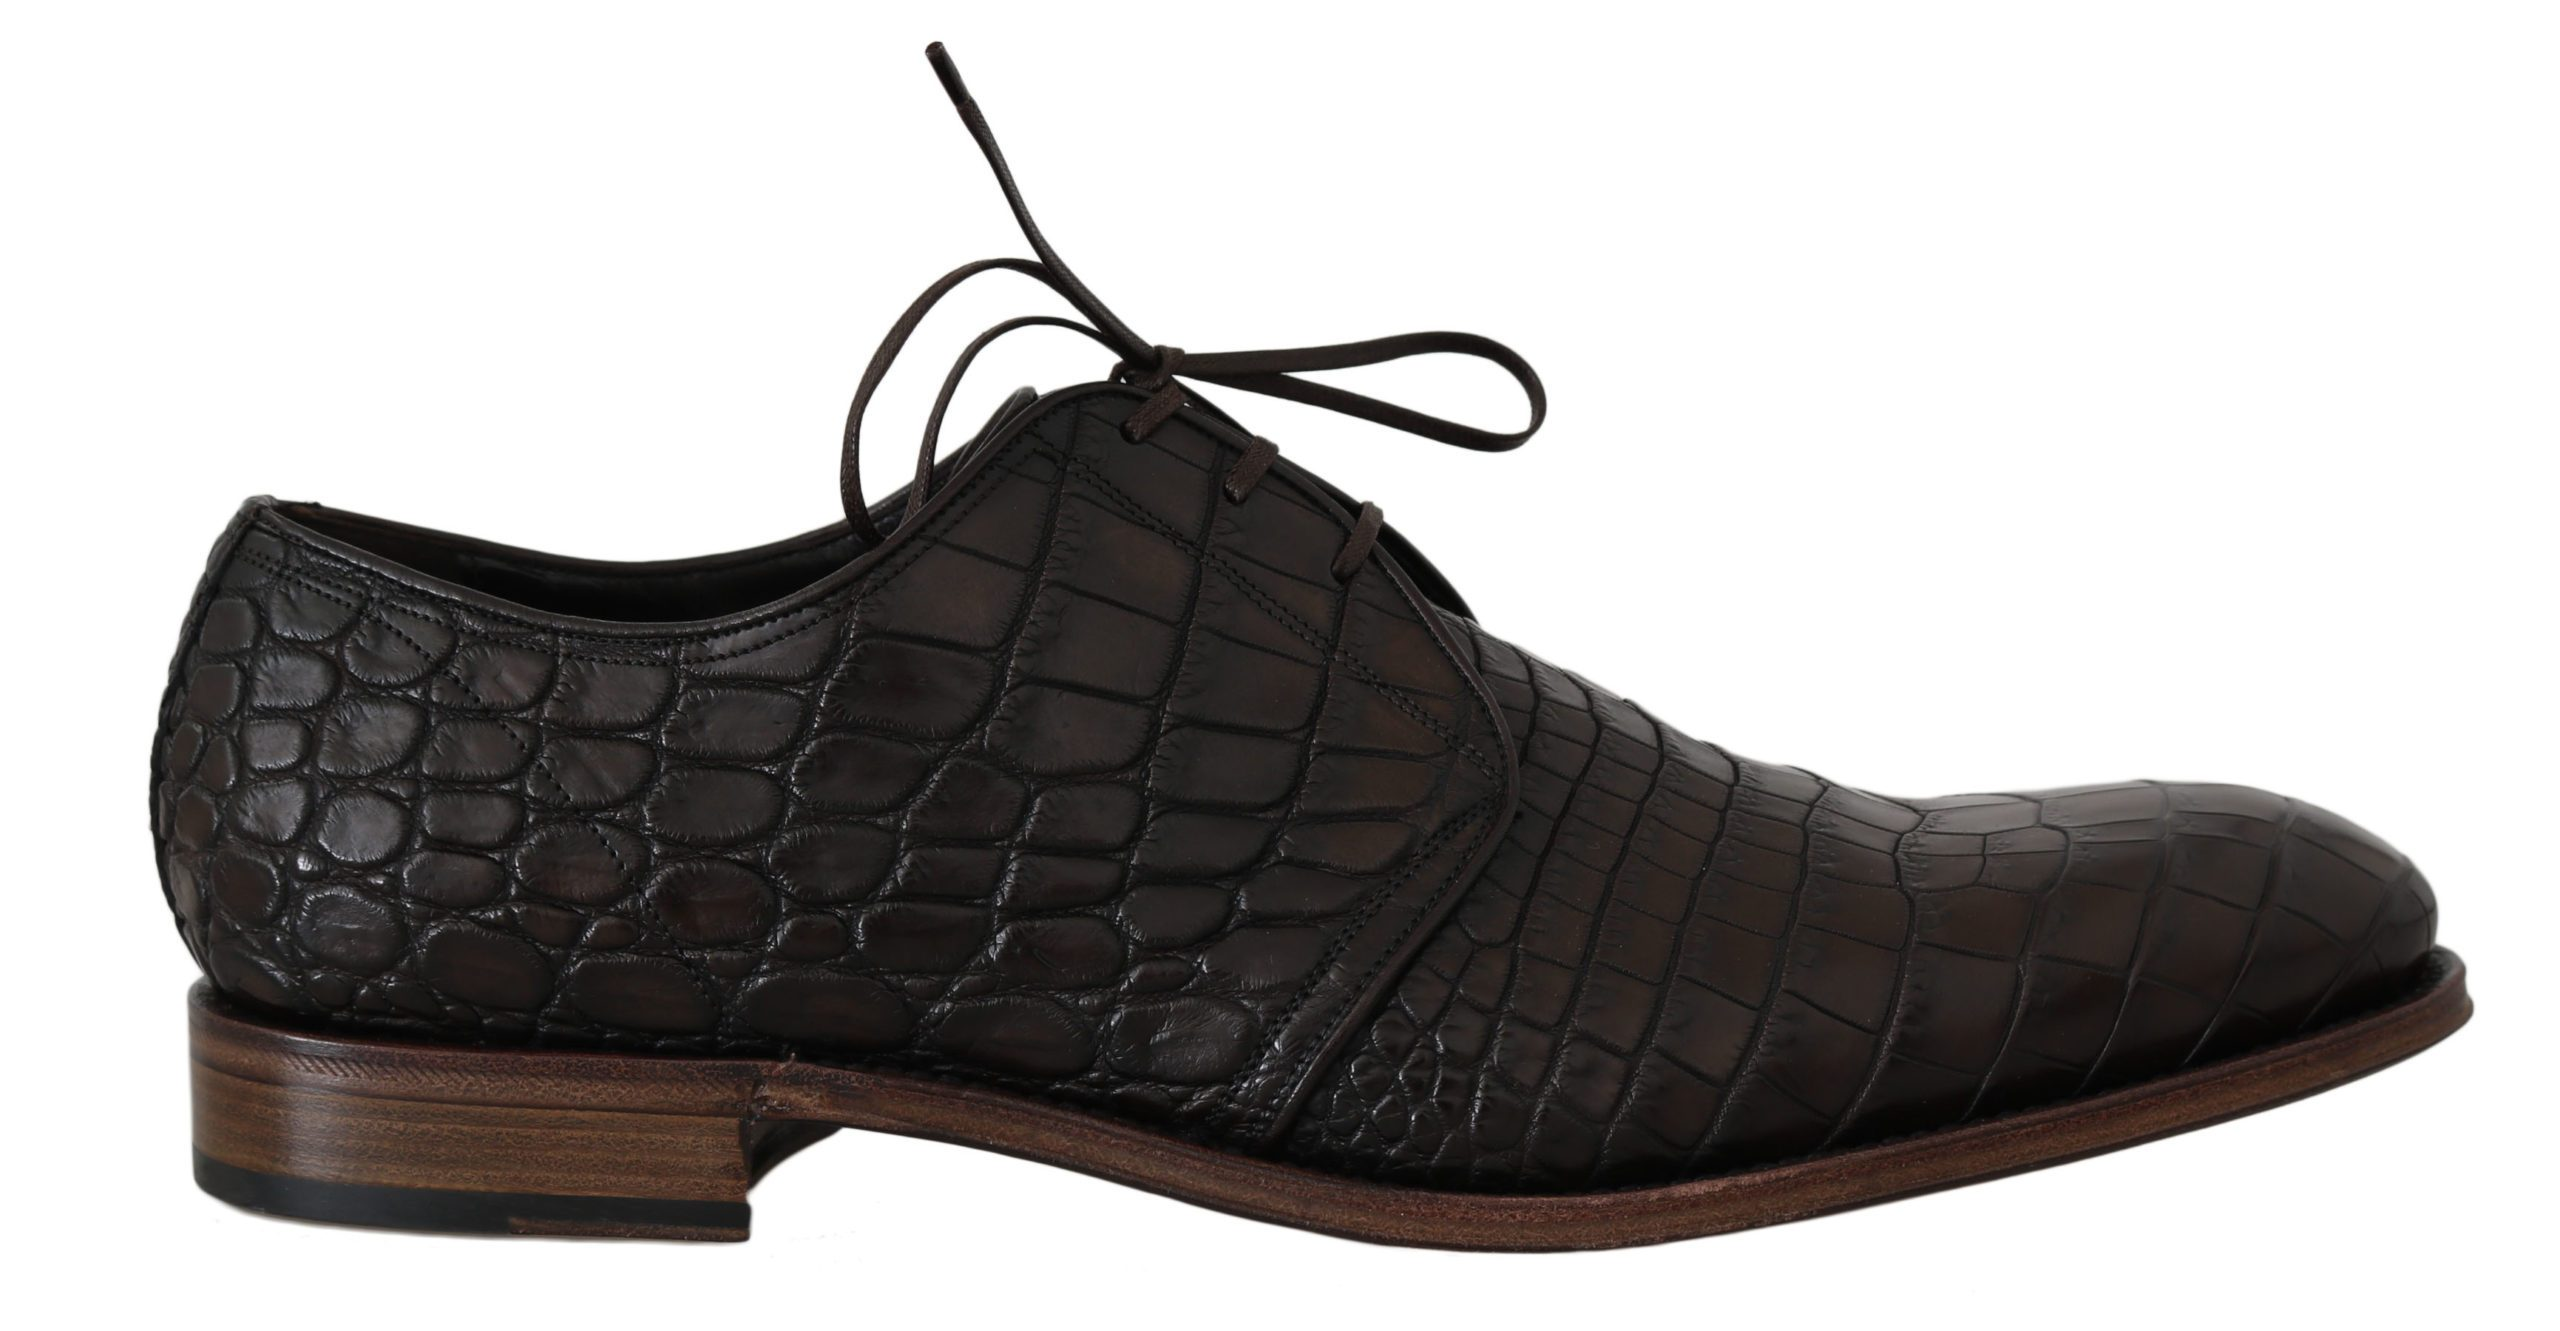 Dolce & Gabbana Men's Patterned Leather Derby Shoes Brown MV2310 - EU44/US11